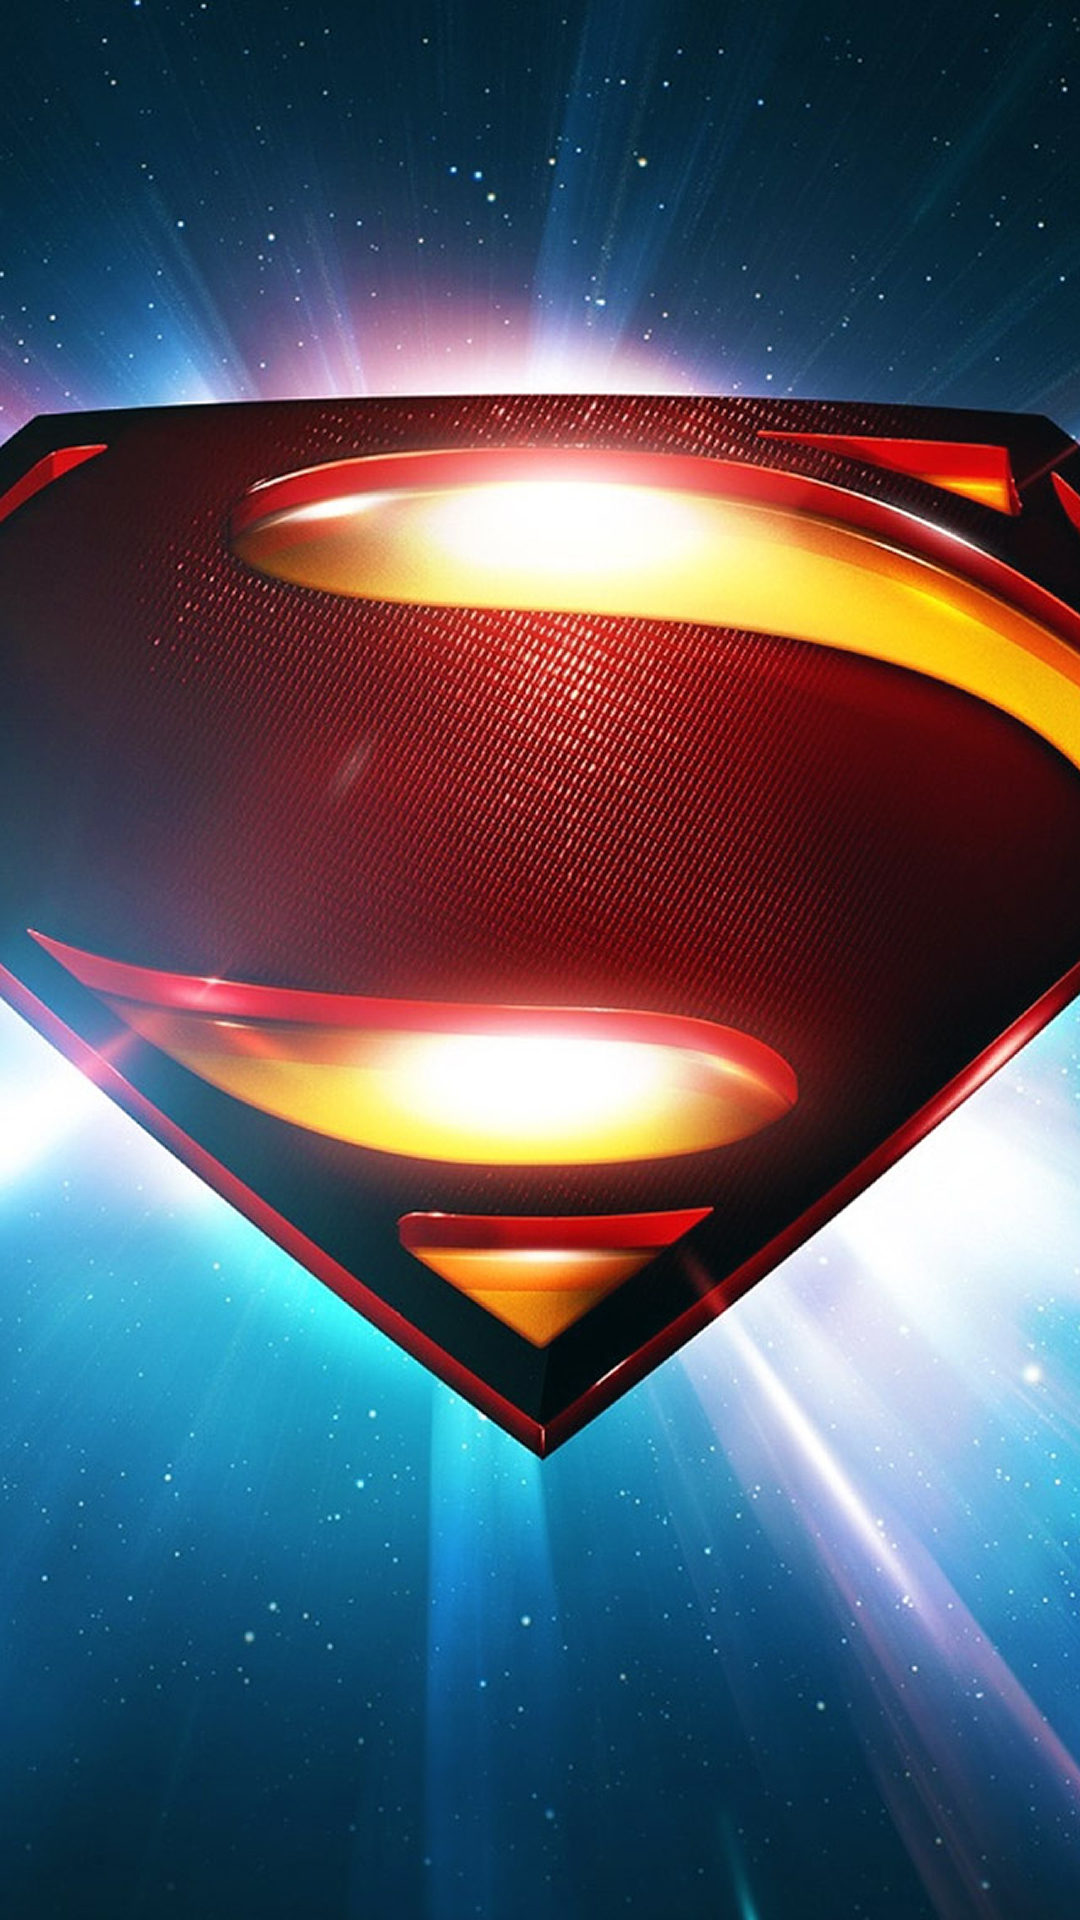 Superman Space Logo Man Of Steel iPhone 6 Wallpaper Download iPhone 1080x1920